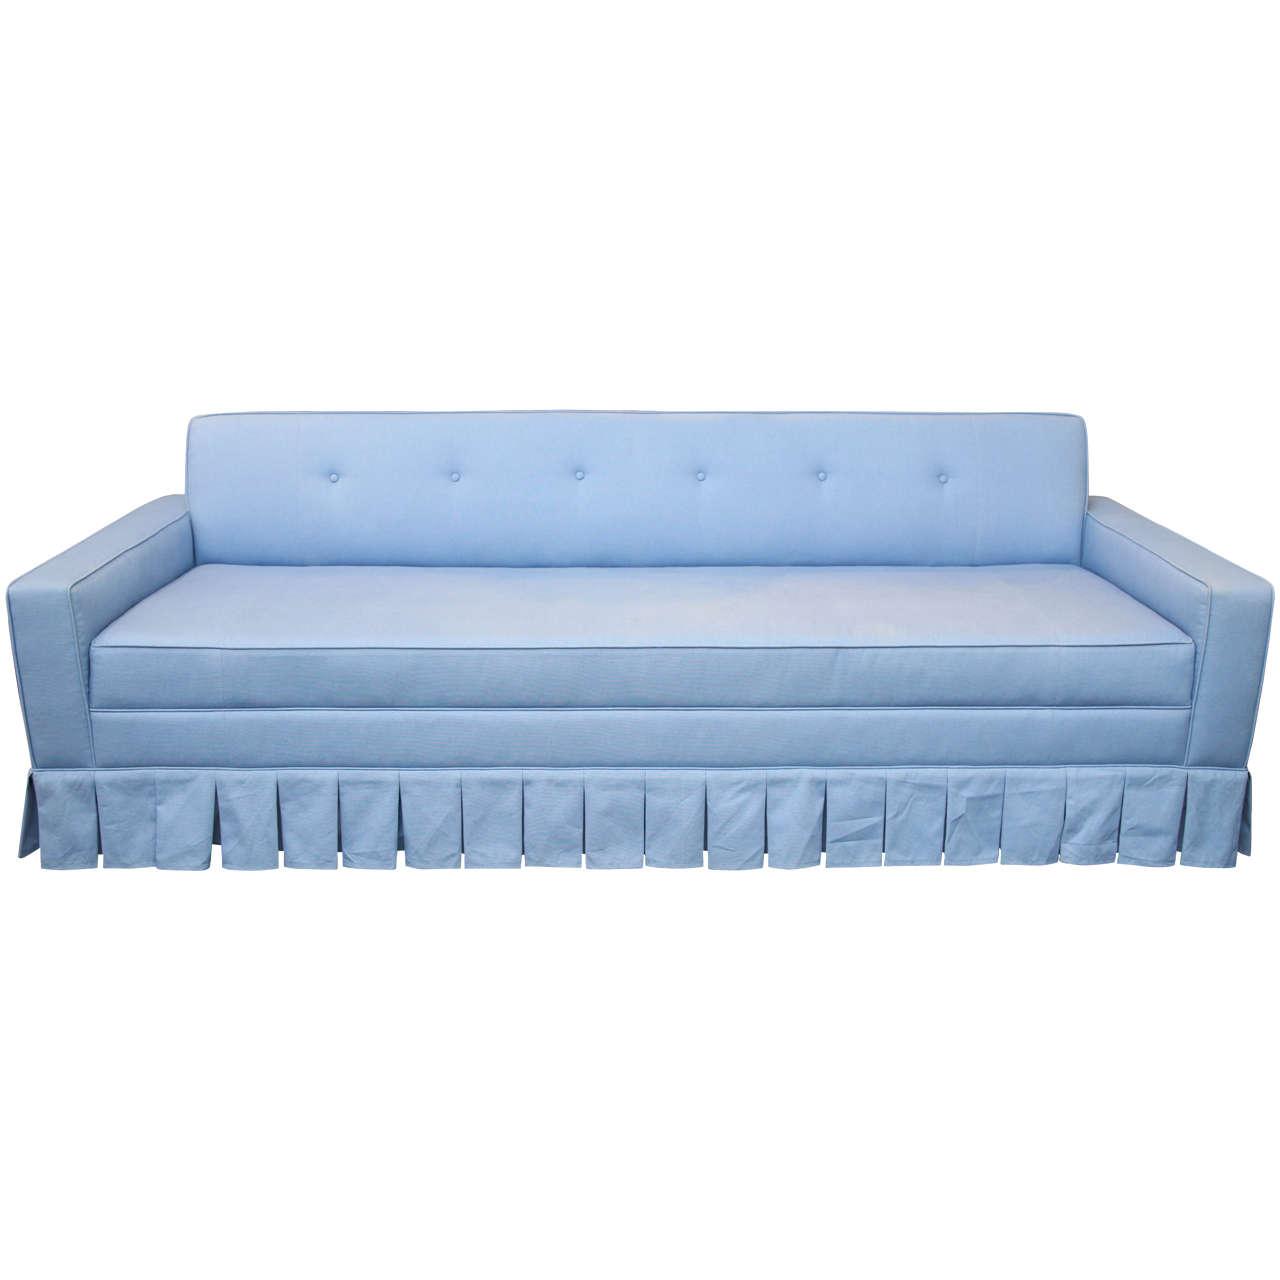 Midcentury Low Tufted Sofa